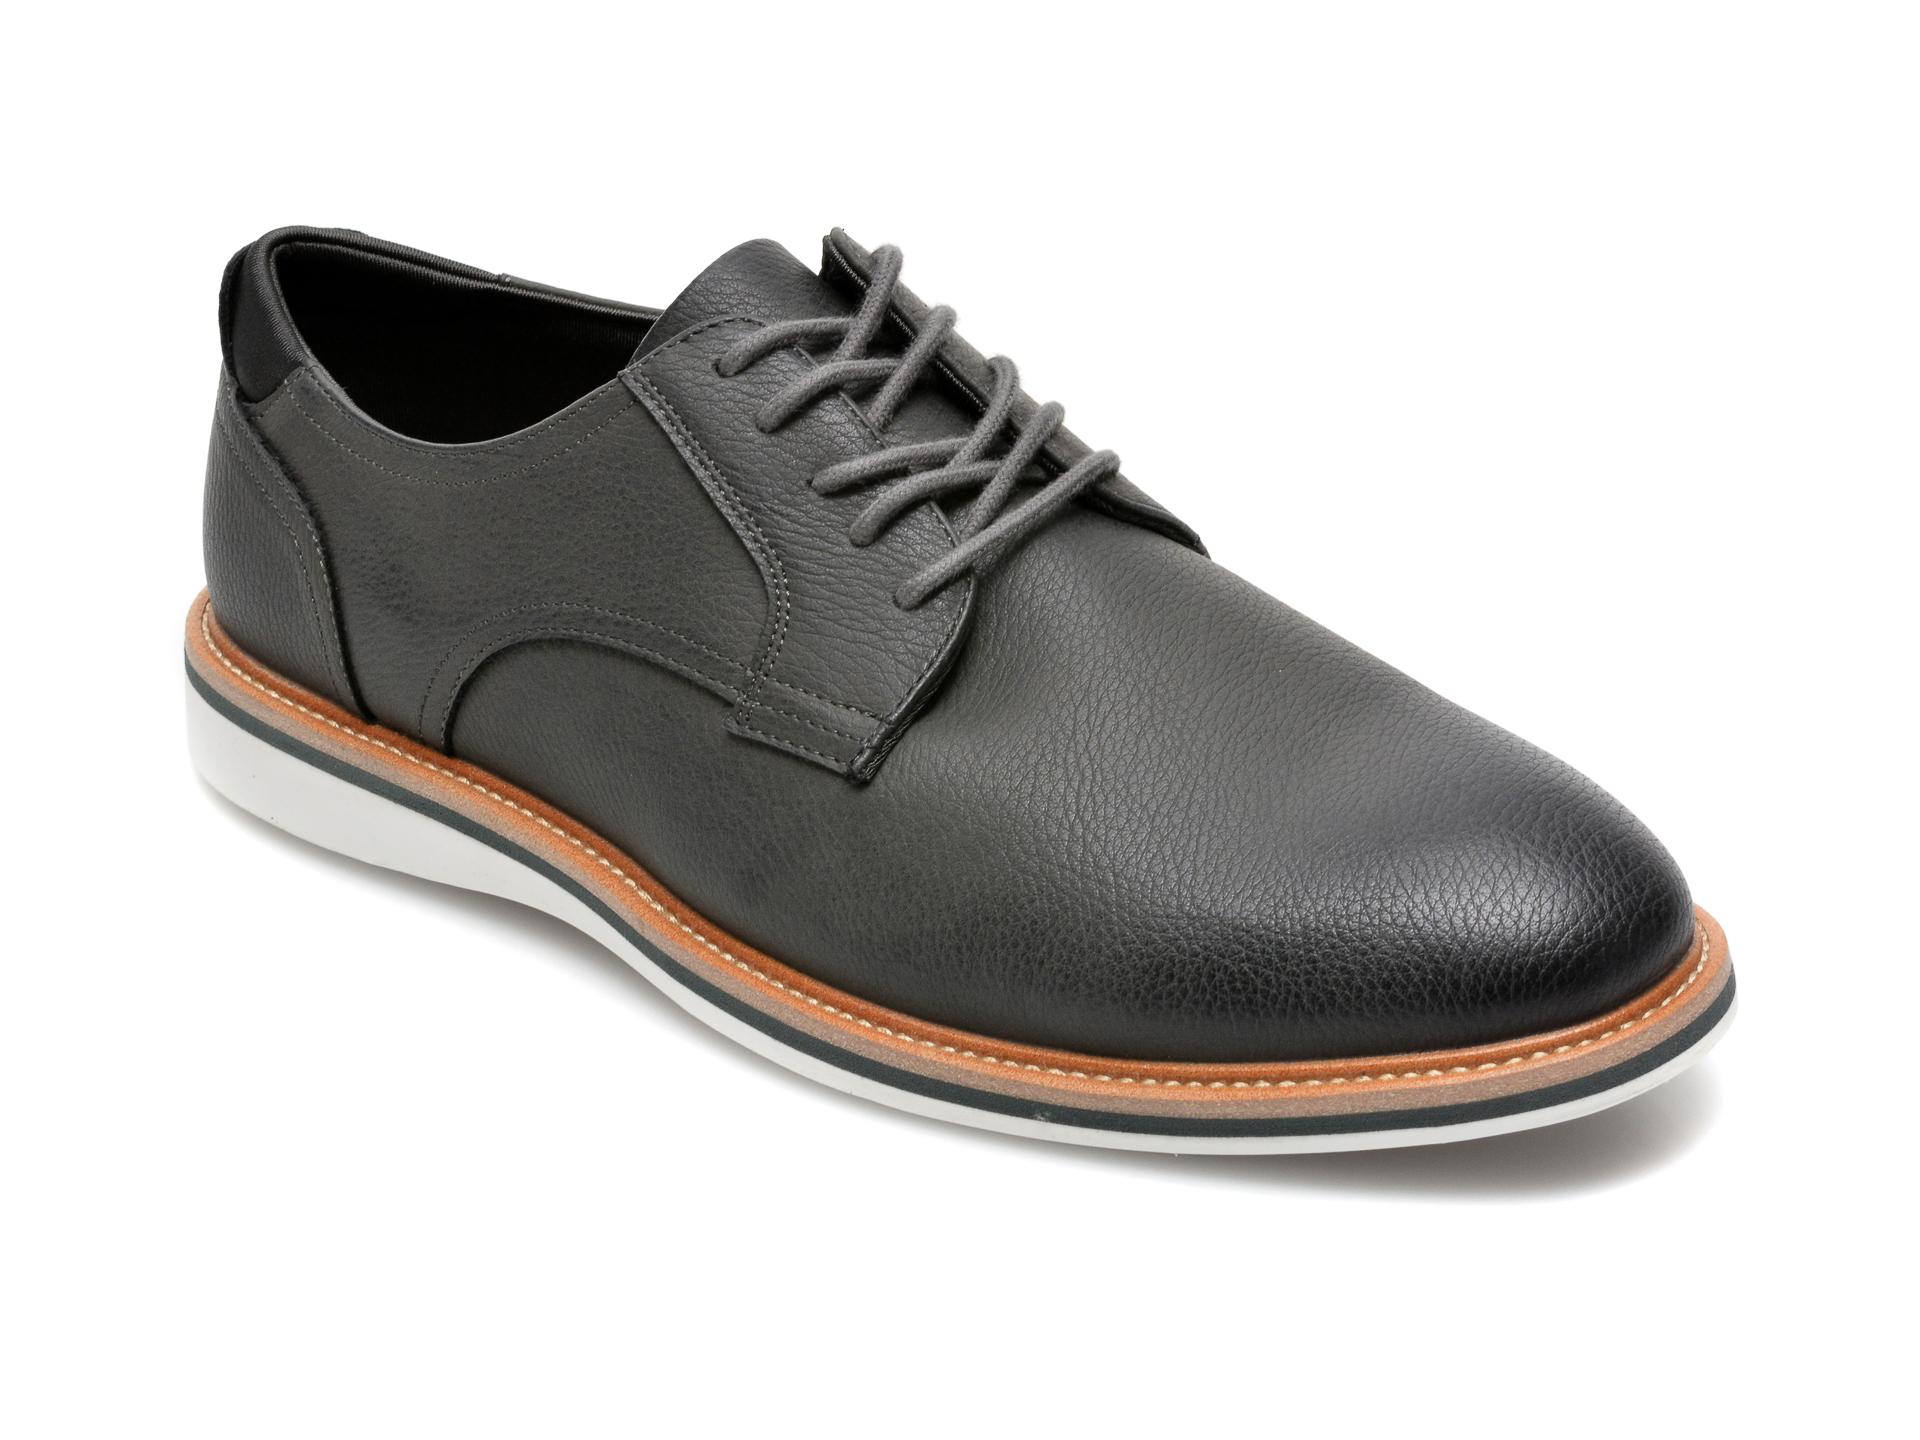 Pantofi ALDO gri, Olirang-W021, din piele ecologica imagine otter.ro 2021